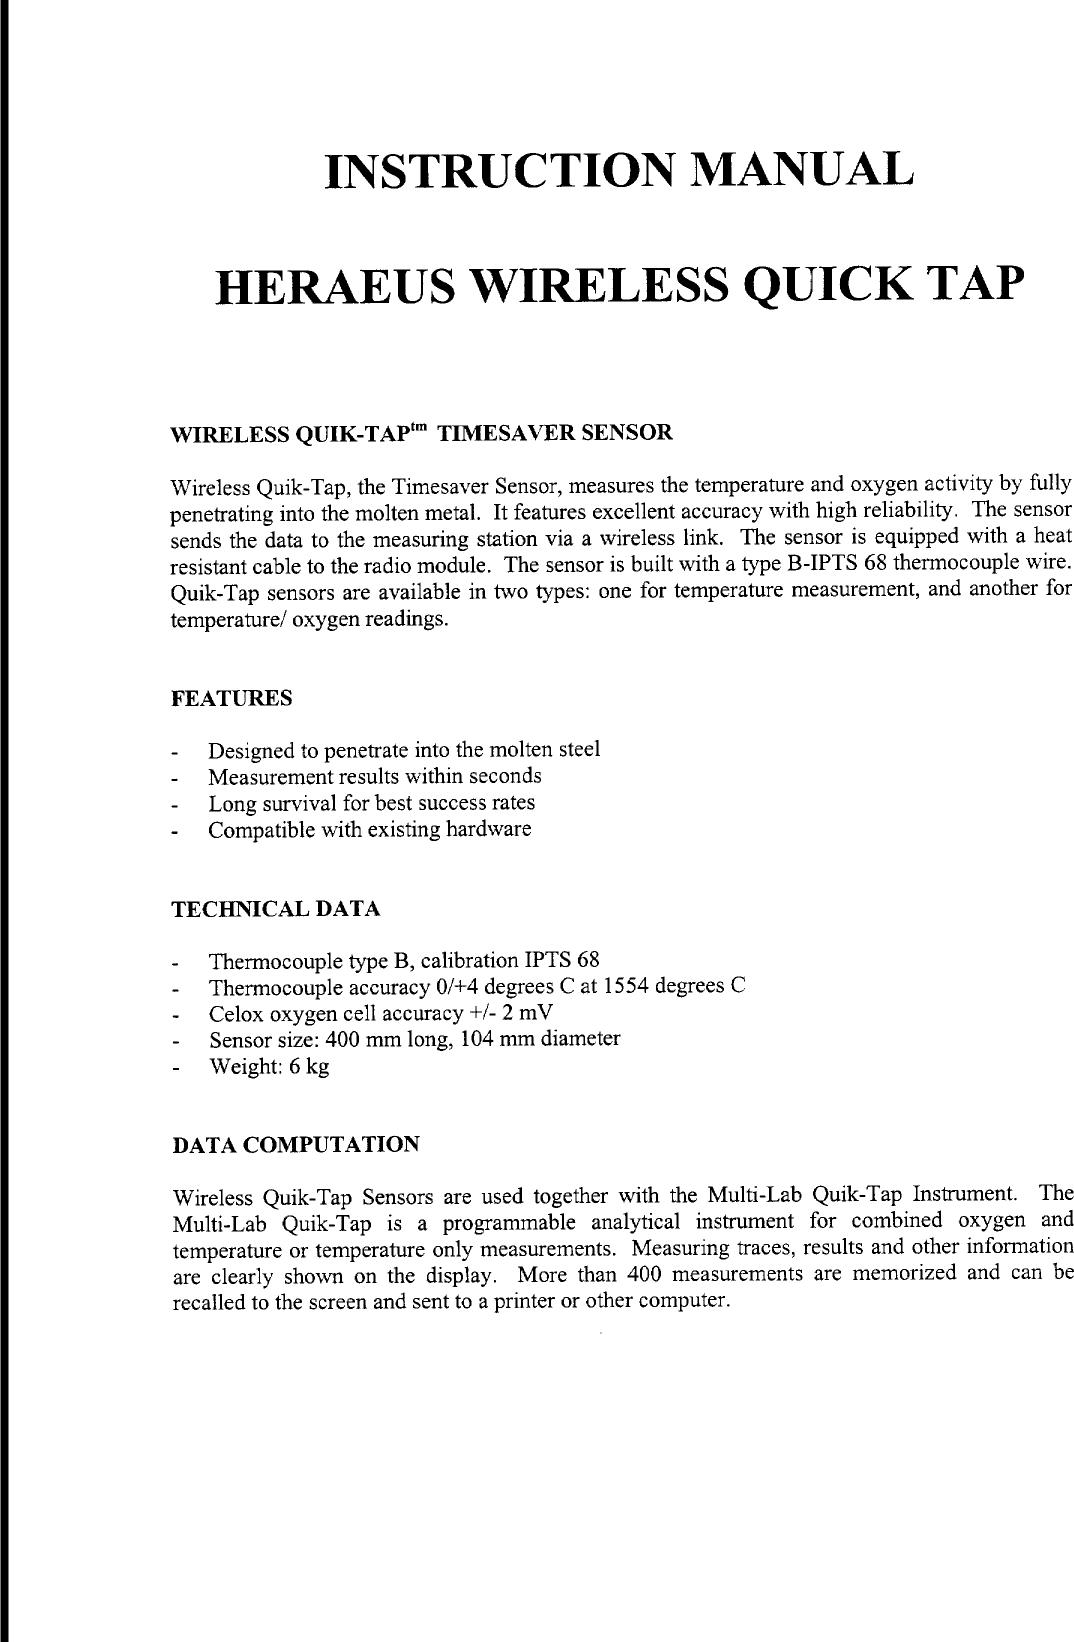 electro nite checkmate 4 manual